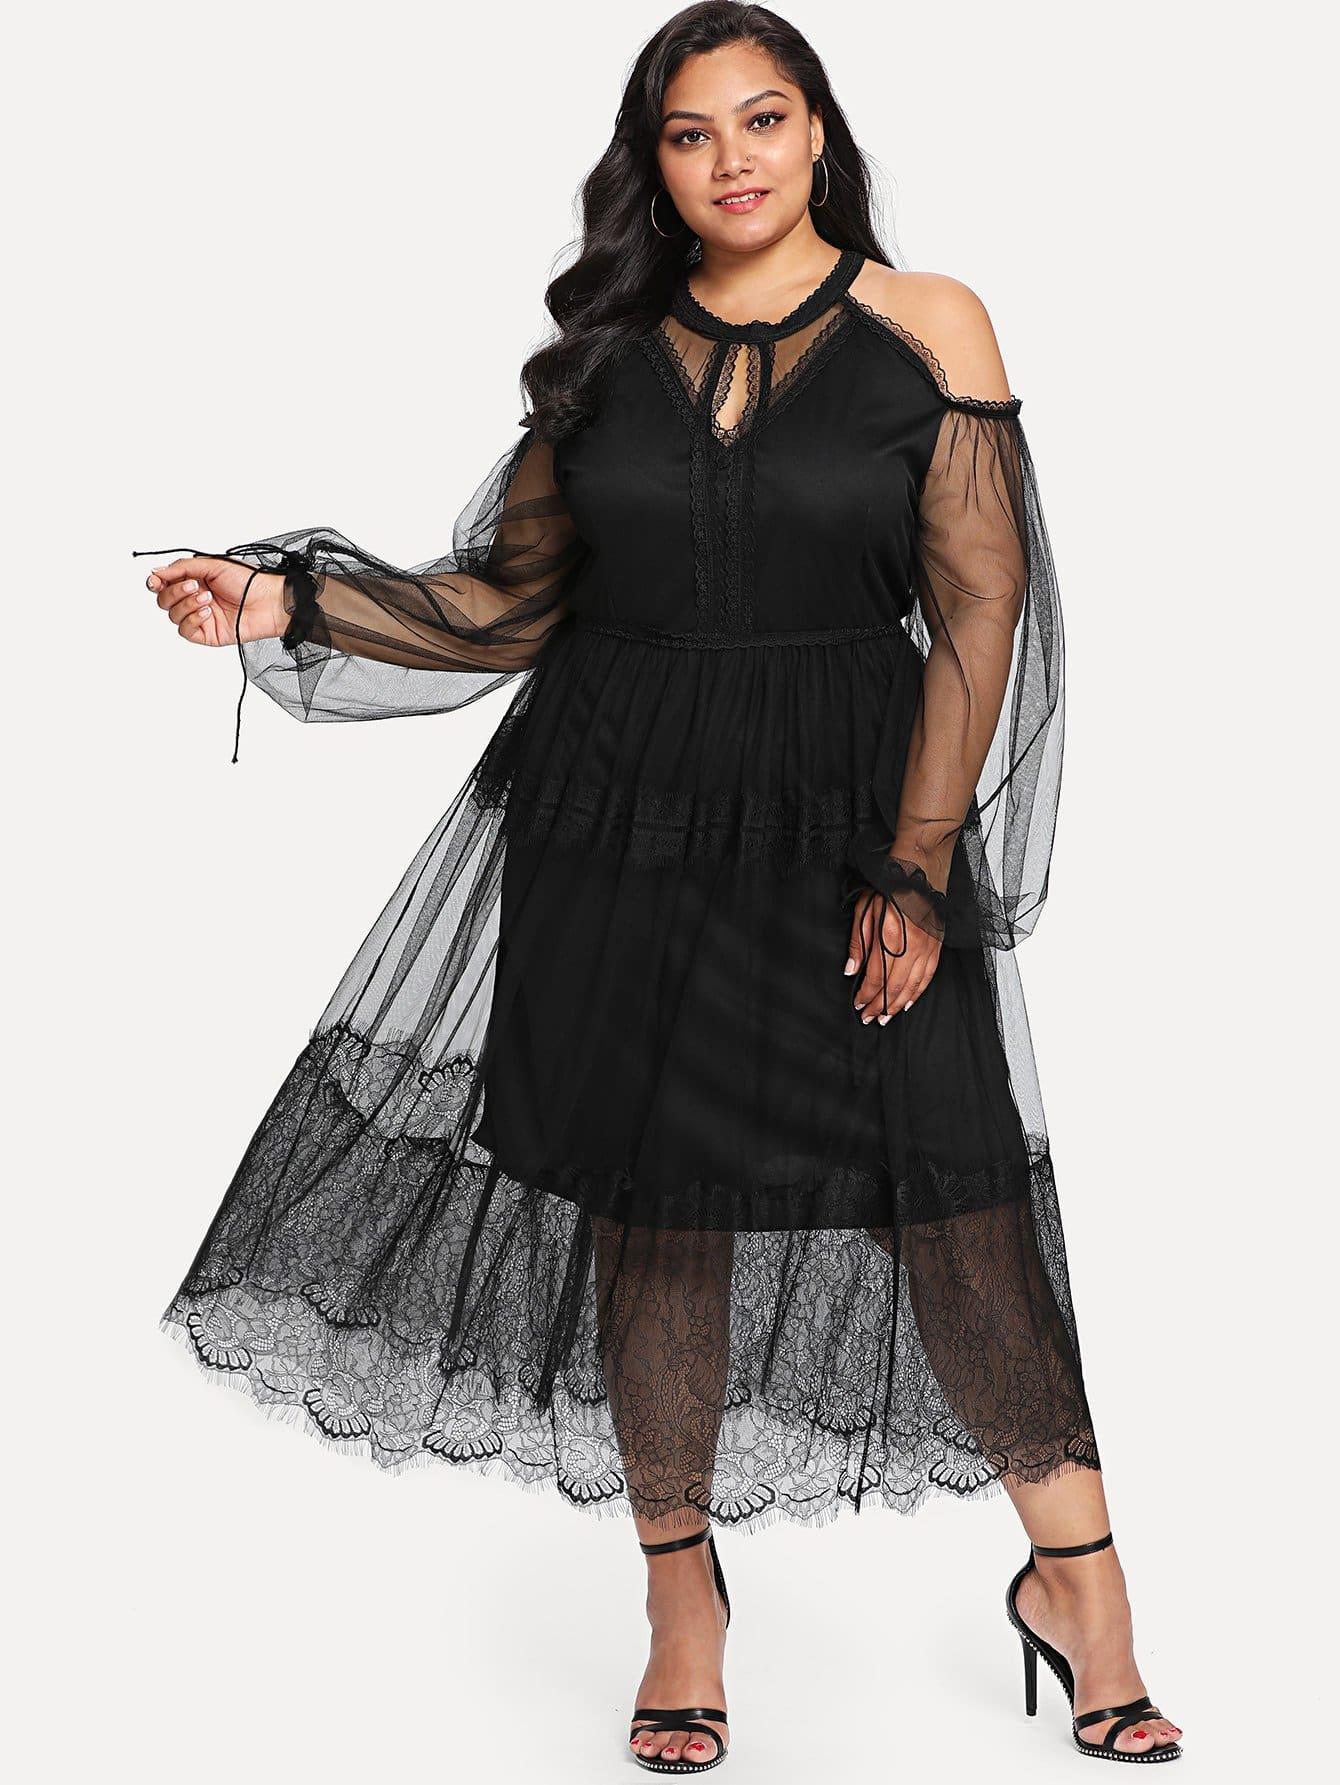 Plus Keyhole Halter Neck Lace Trim Mesh Overlay Dress white sleeveless mesh and lace overlay details playsuit